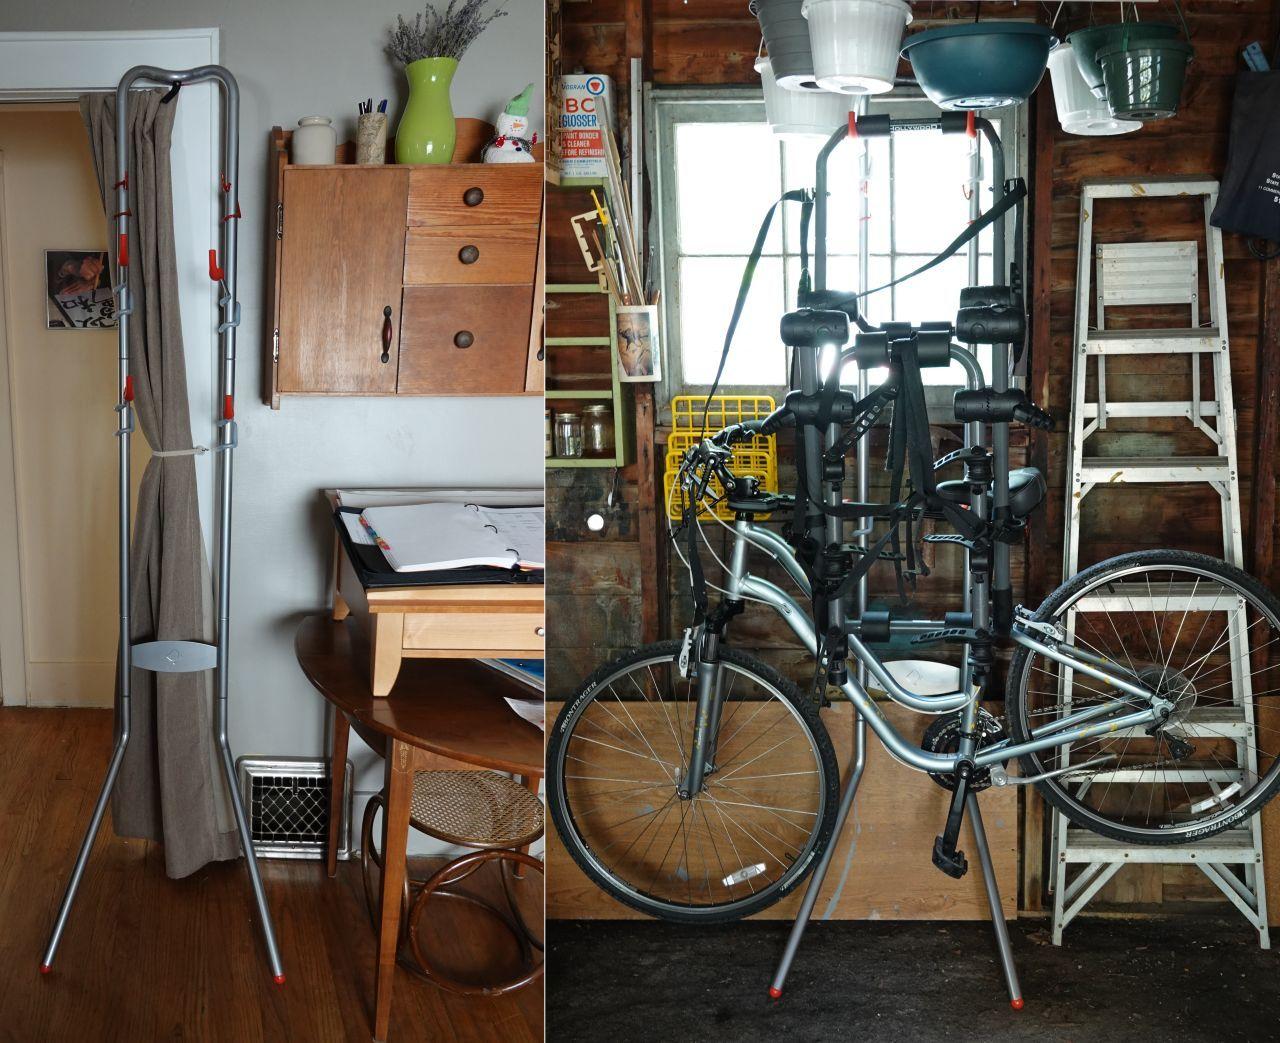 wonderful gravity based bike rack that both